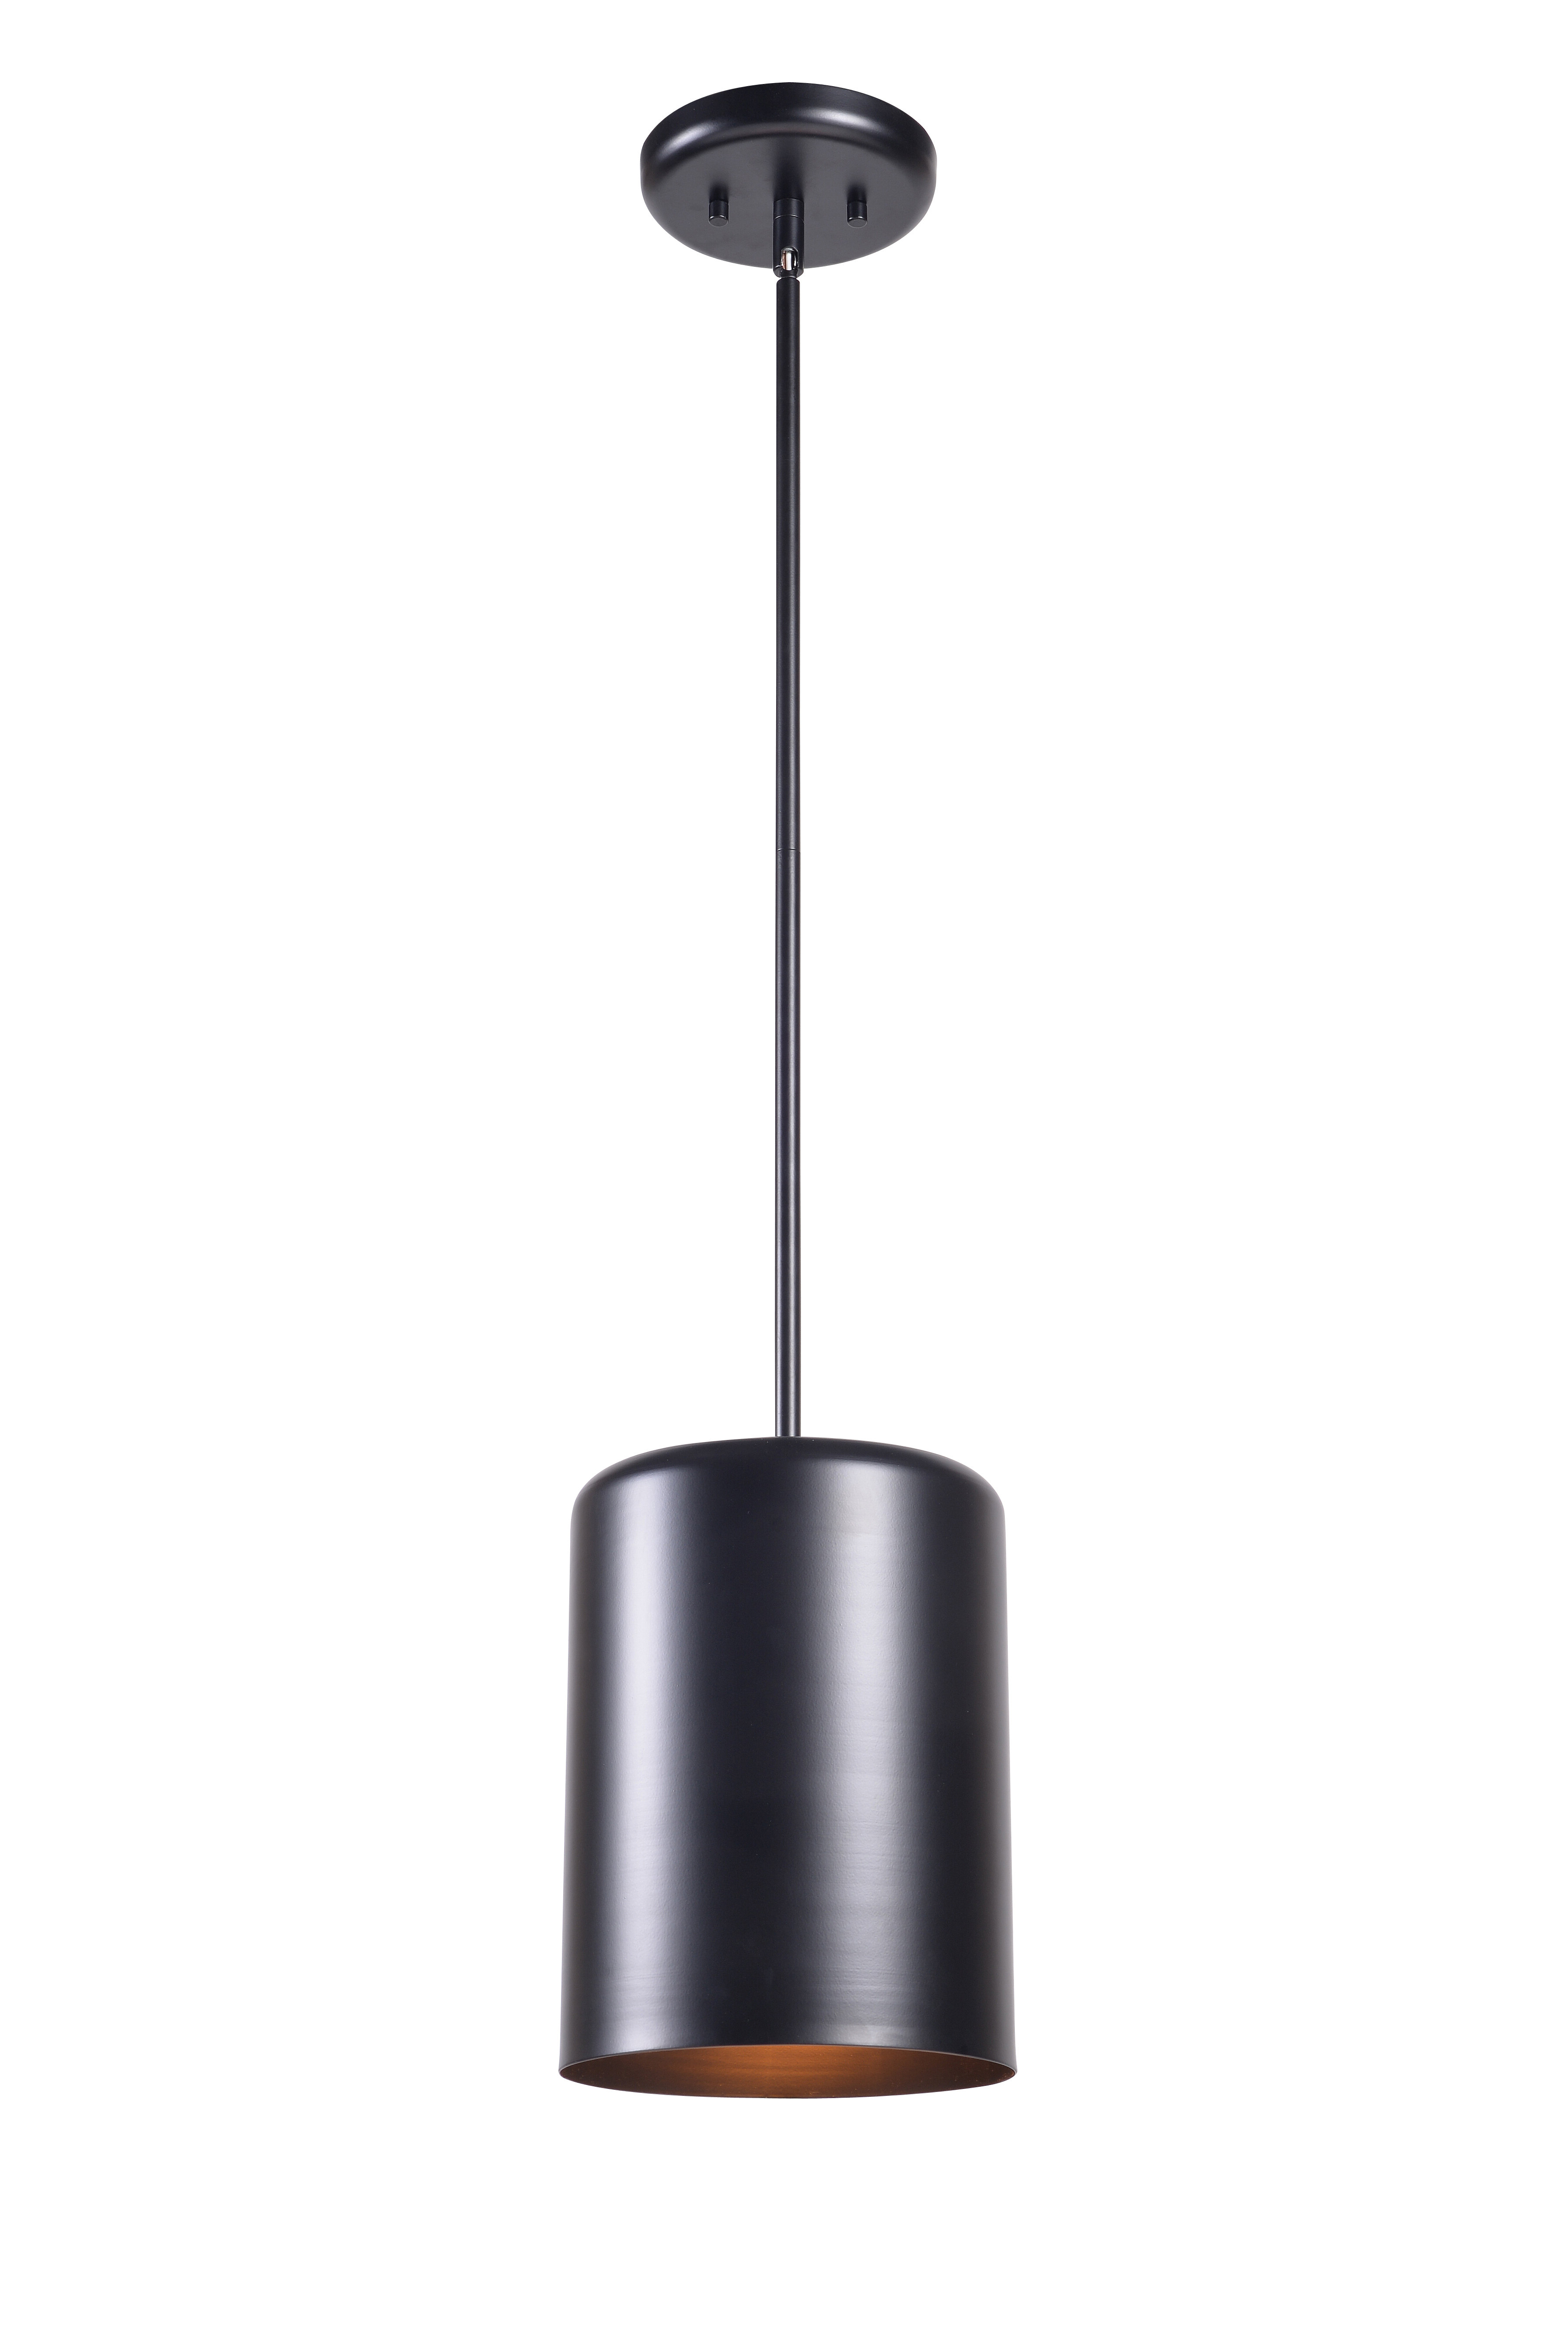 Widely Used Angelina 1 Light Single Cylinder Pendants In Clancy 1 Light Single Cylinder Pendant (View 20 of 20)